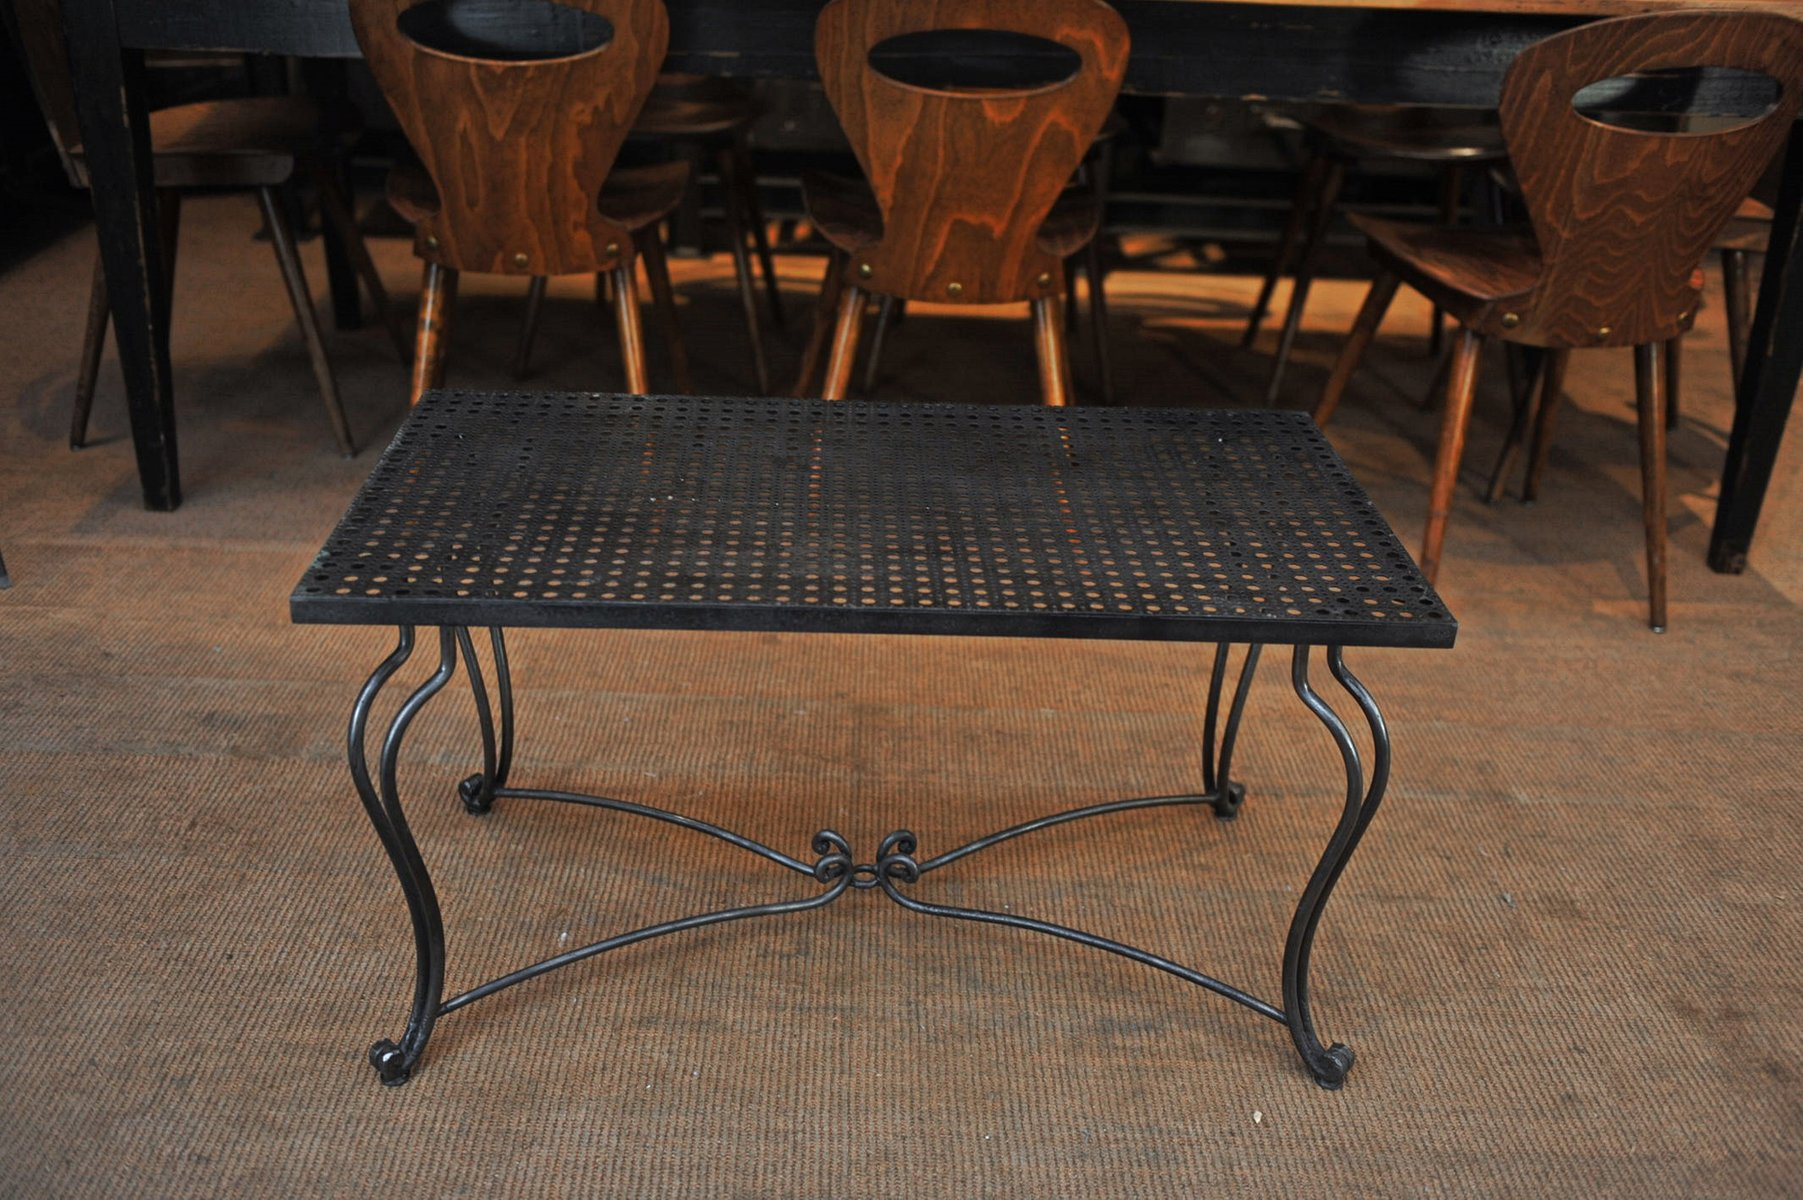 table basse en m tal perfor e avec pied en fer forg 1940s en vente sur pamono. Black Bedroom Furniture Sets. Home Design Ideas